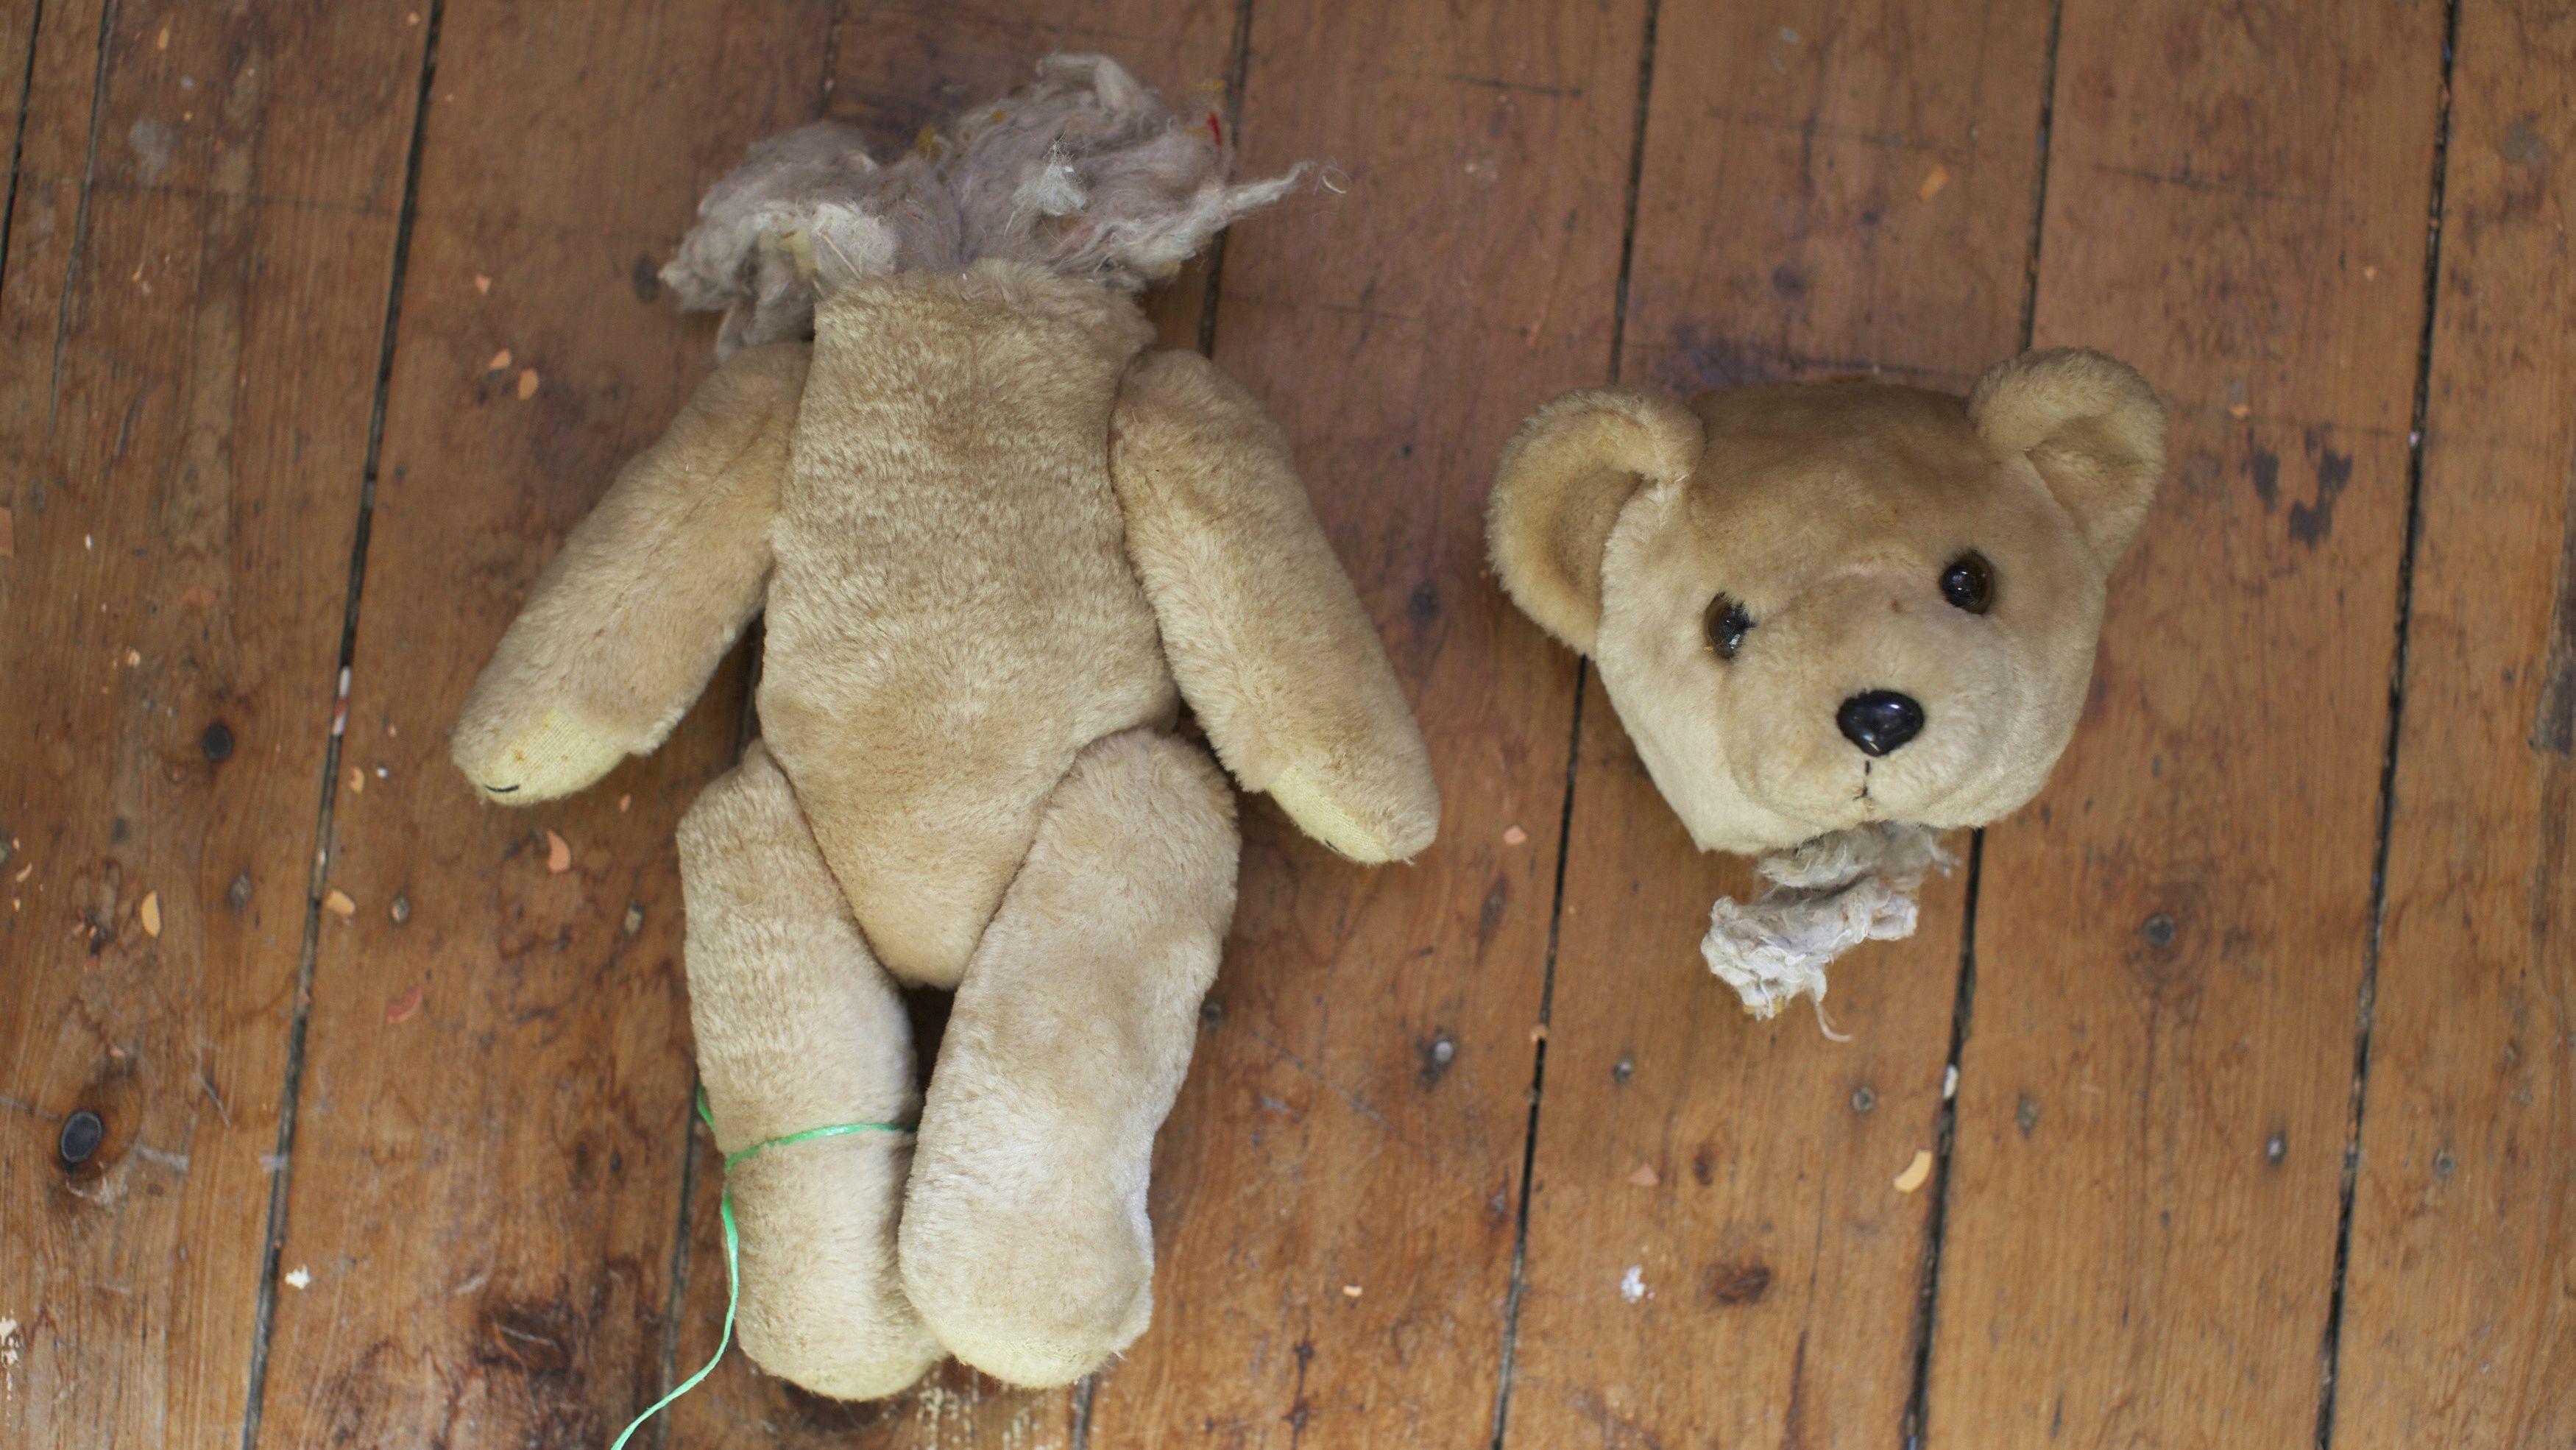 Teddy bear in peril